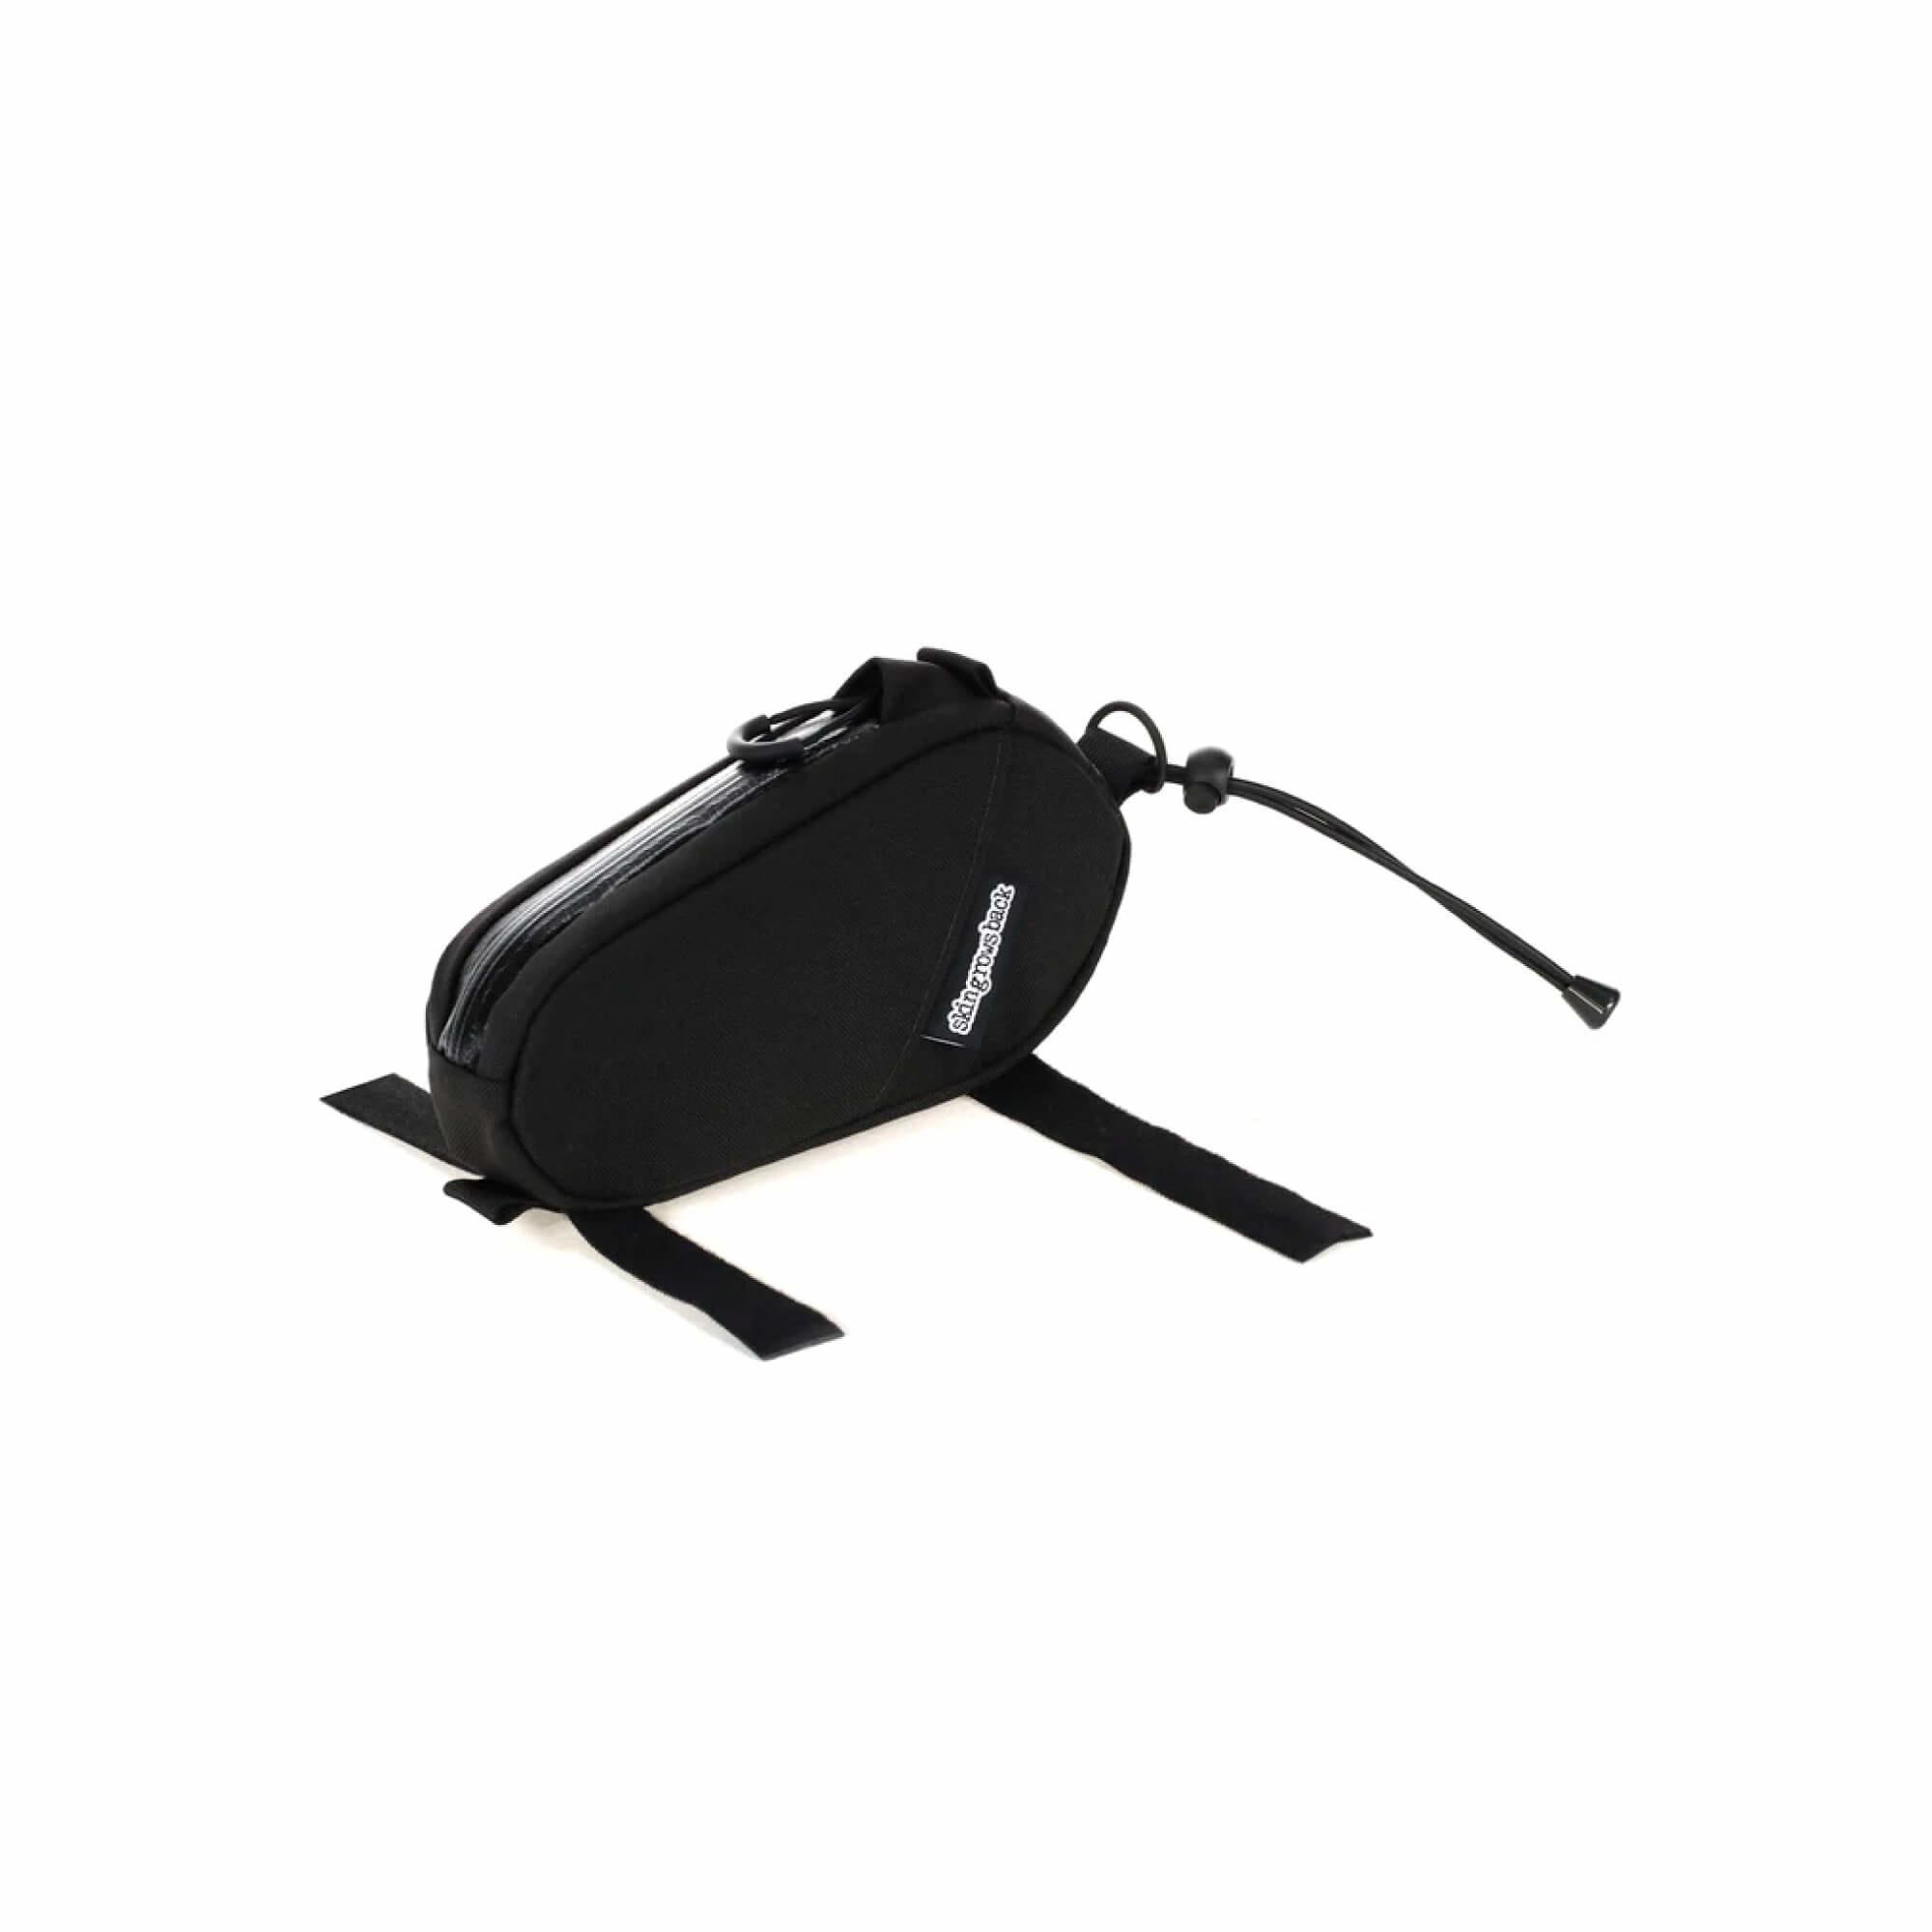 Amigo Top Tube Bag Black-7